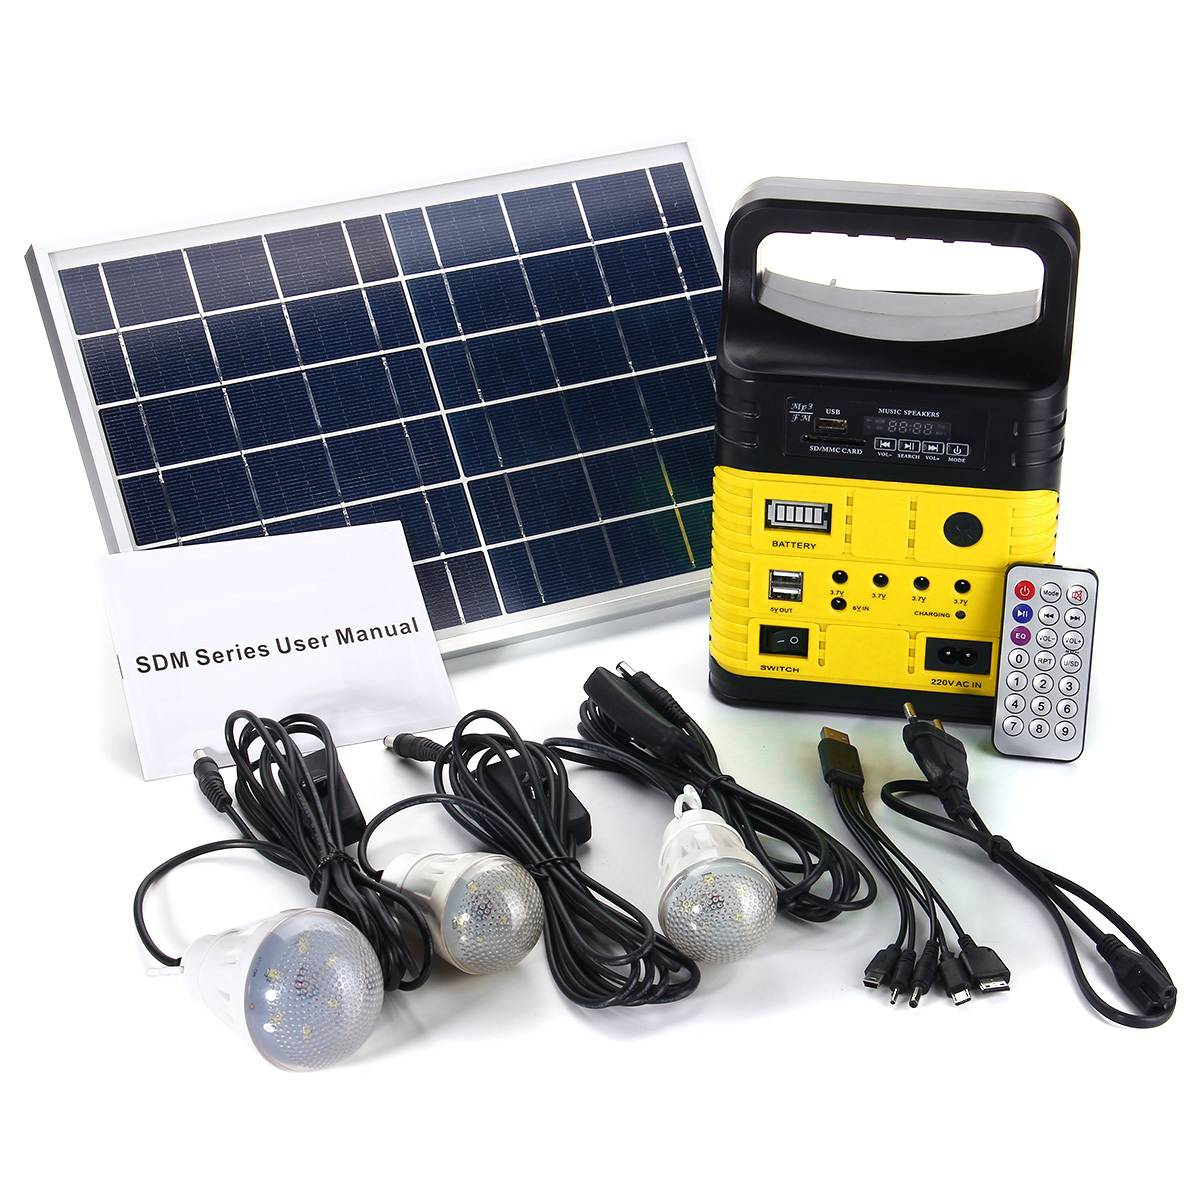 Generador Solar portátil de 10W, potencia exterior, Mini Panel Solar DC6W, sistema de iluminación LED de carga de batería de plomo-ácido 6V-9Ah